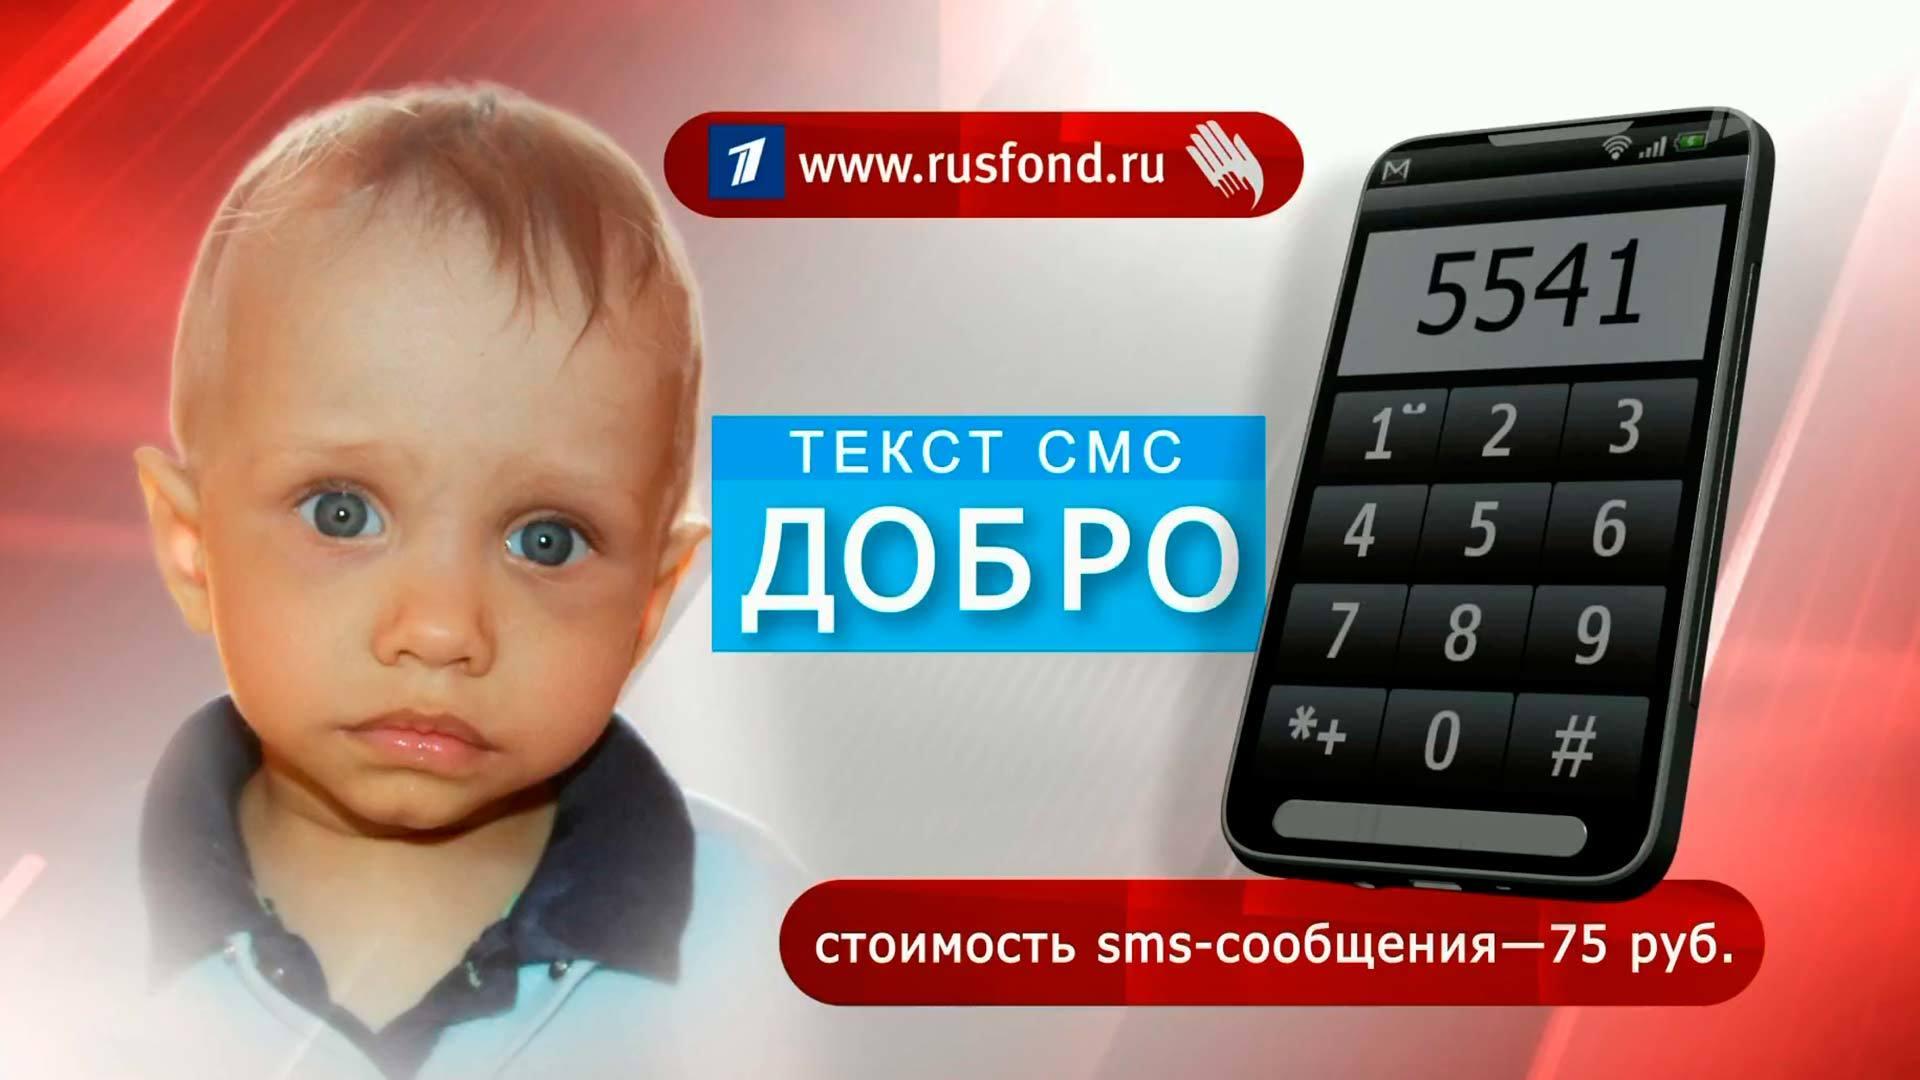 - 5-й канал, путин, саакашвили, фесенко, янукович, админреформа (131210 13:50)  политика украины  цензор видео